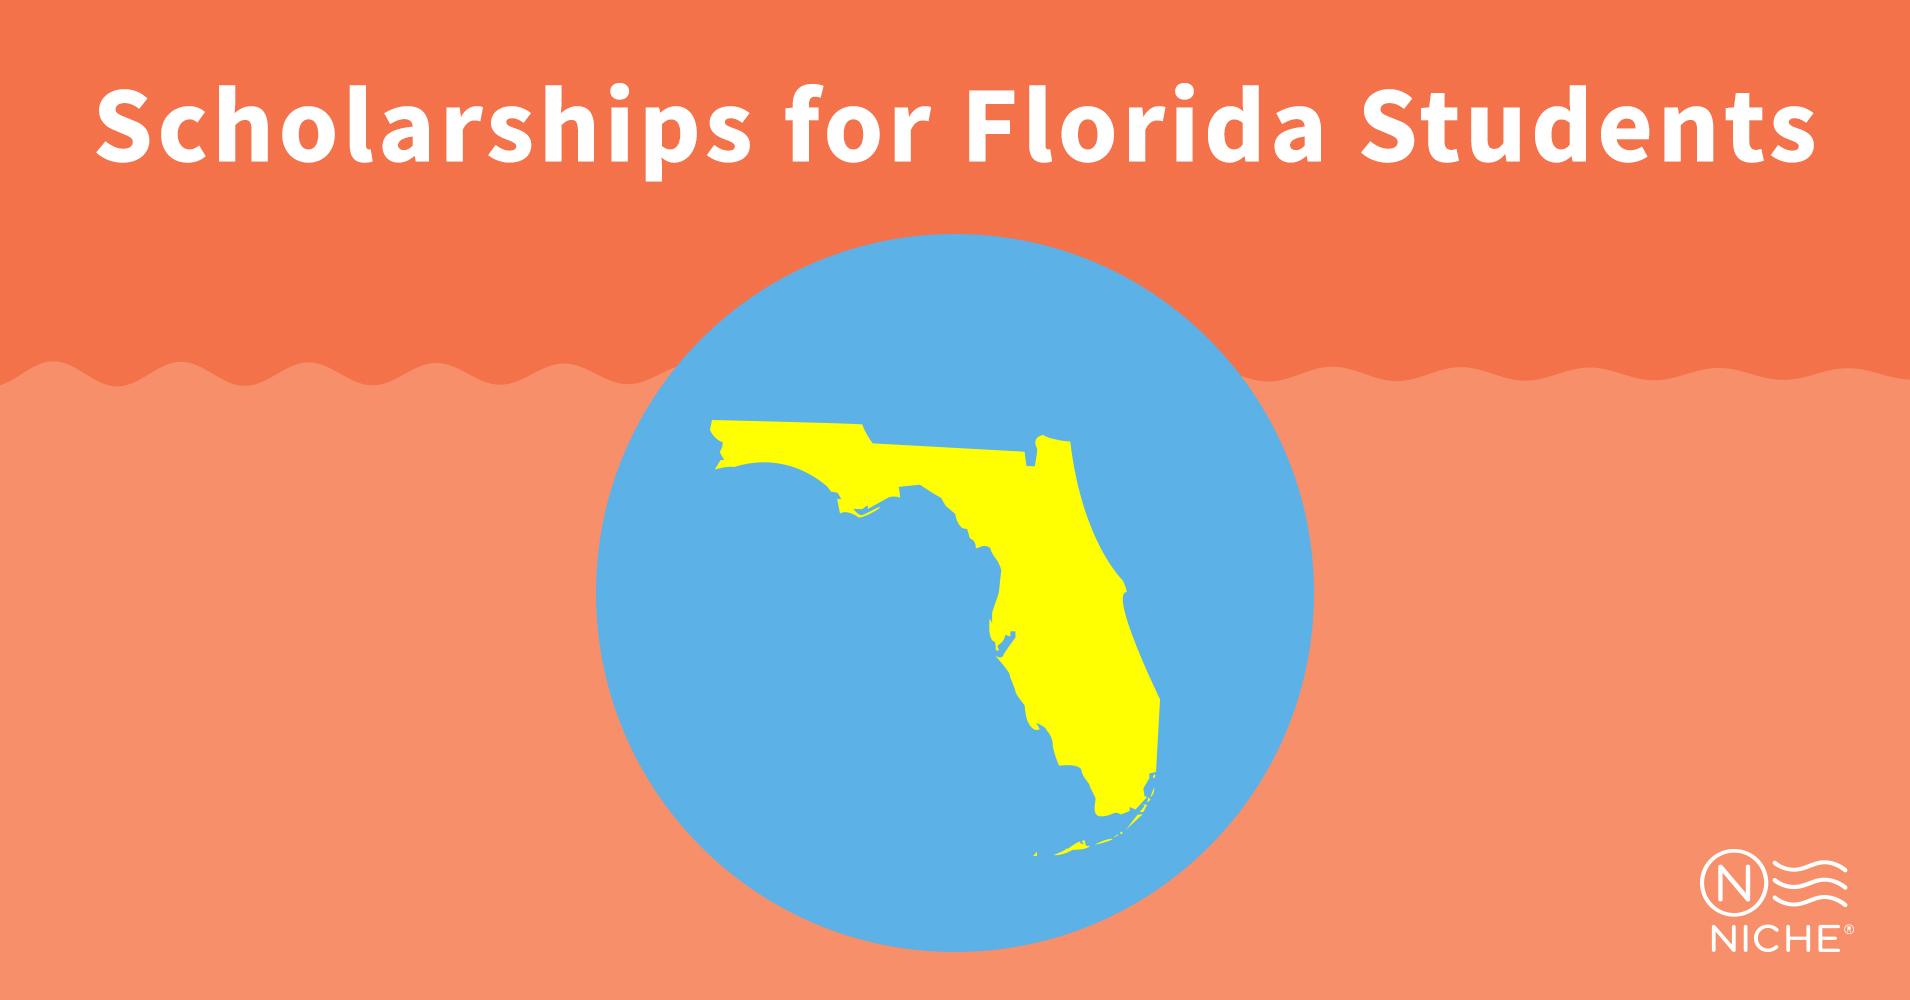 social_share_scholarships_florida_students_v5.jpg